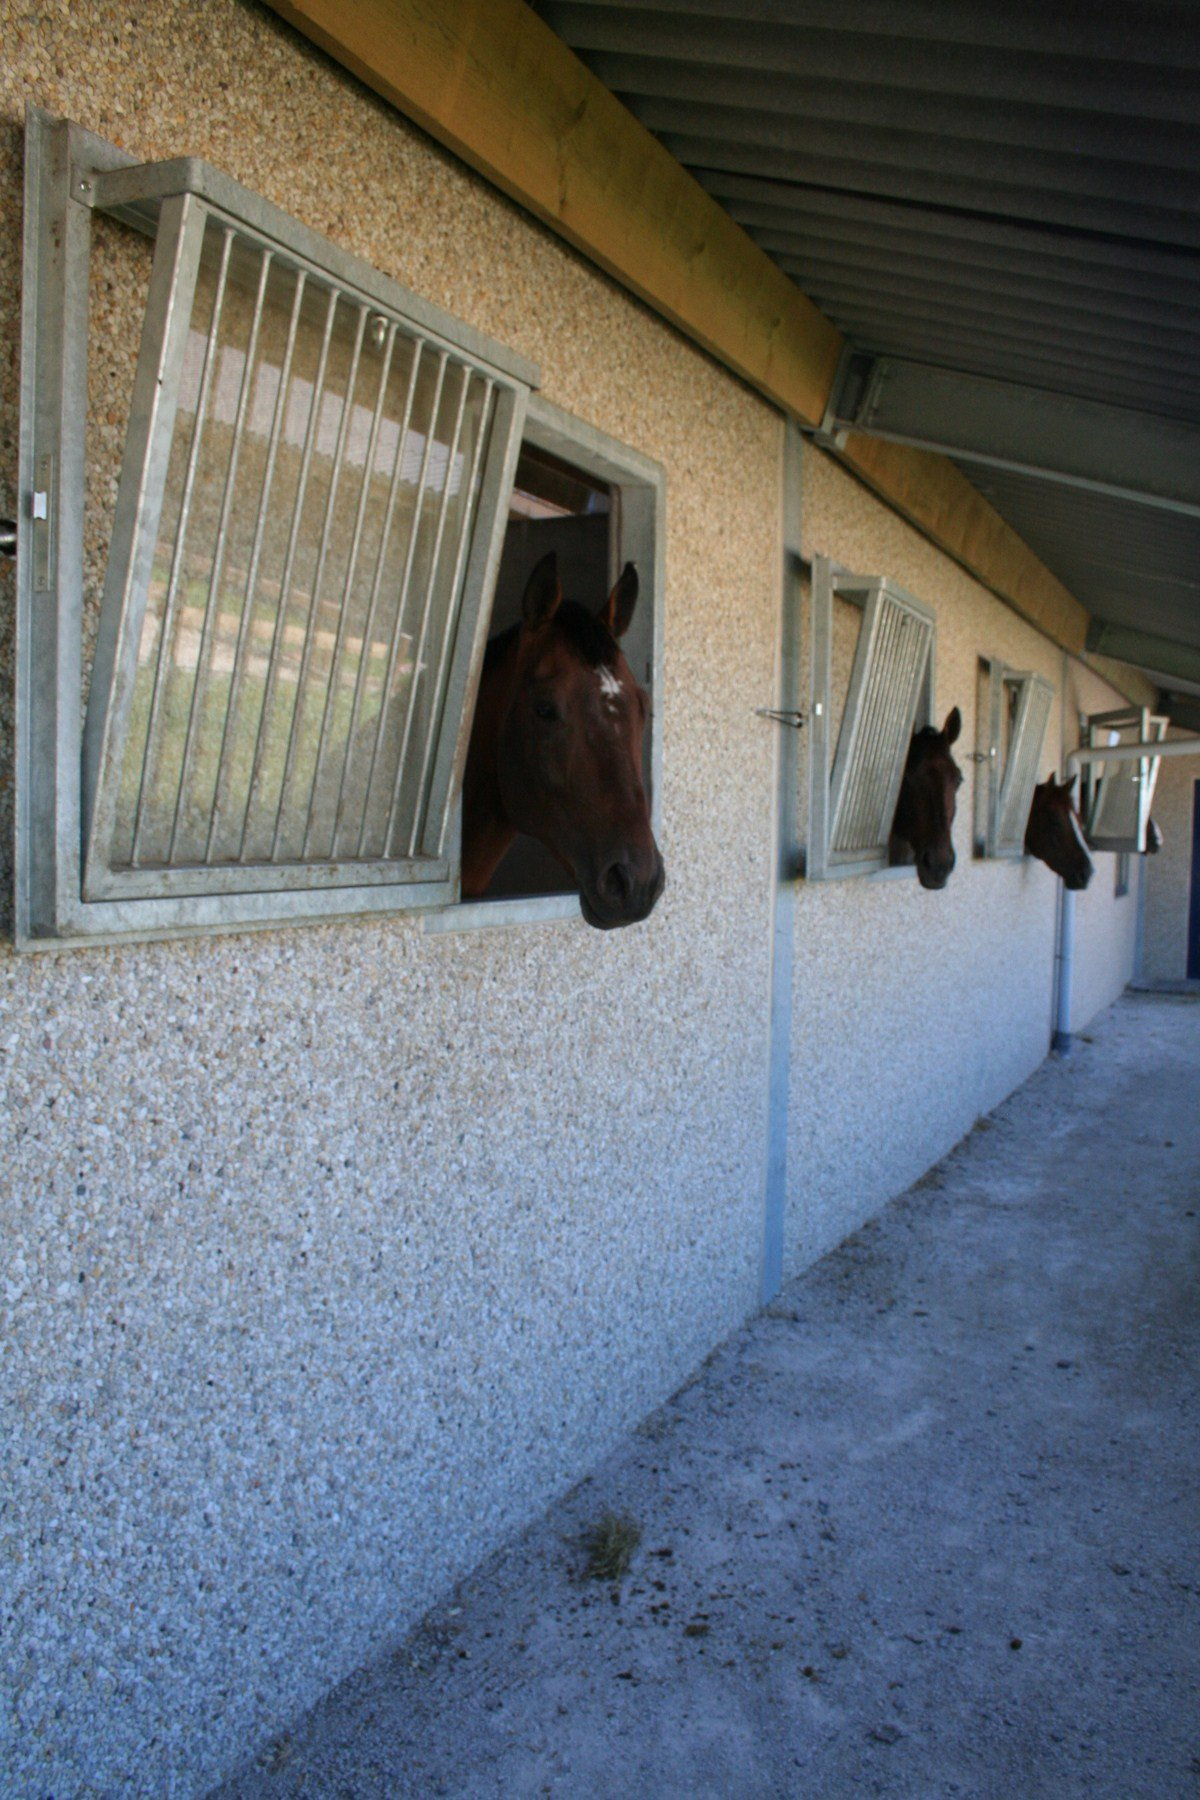 saint hermelle_paardenstallen_paardenboxen_binnenpiste_gouy les Pieton (12)